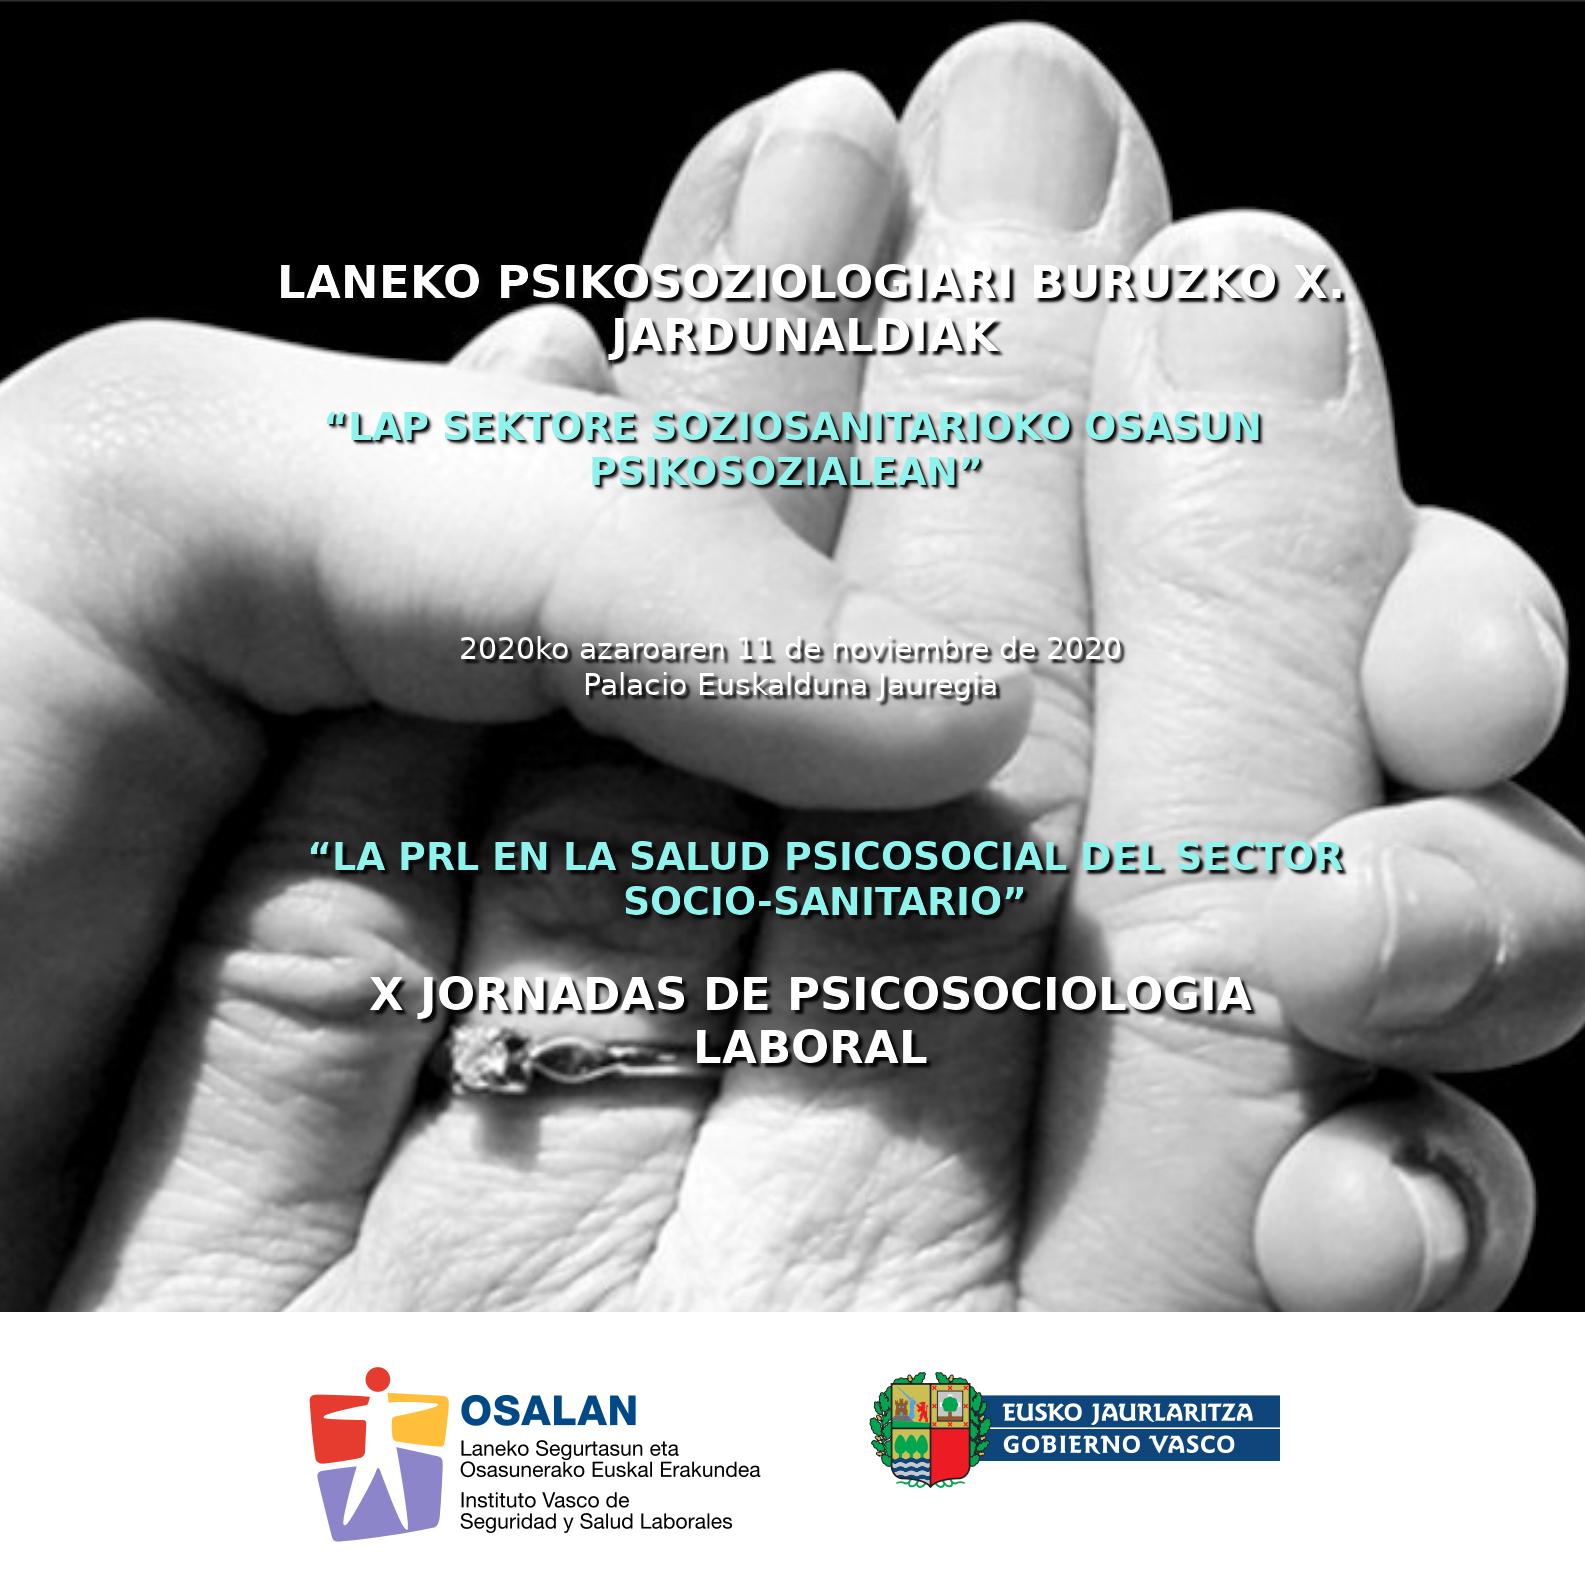 'LAP sektore soziosanitarioko osasun psikosozialean'  /  'La PRL en la salud psicosocial del sector socio-sanitario'